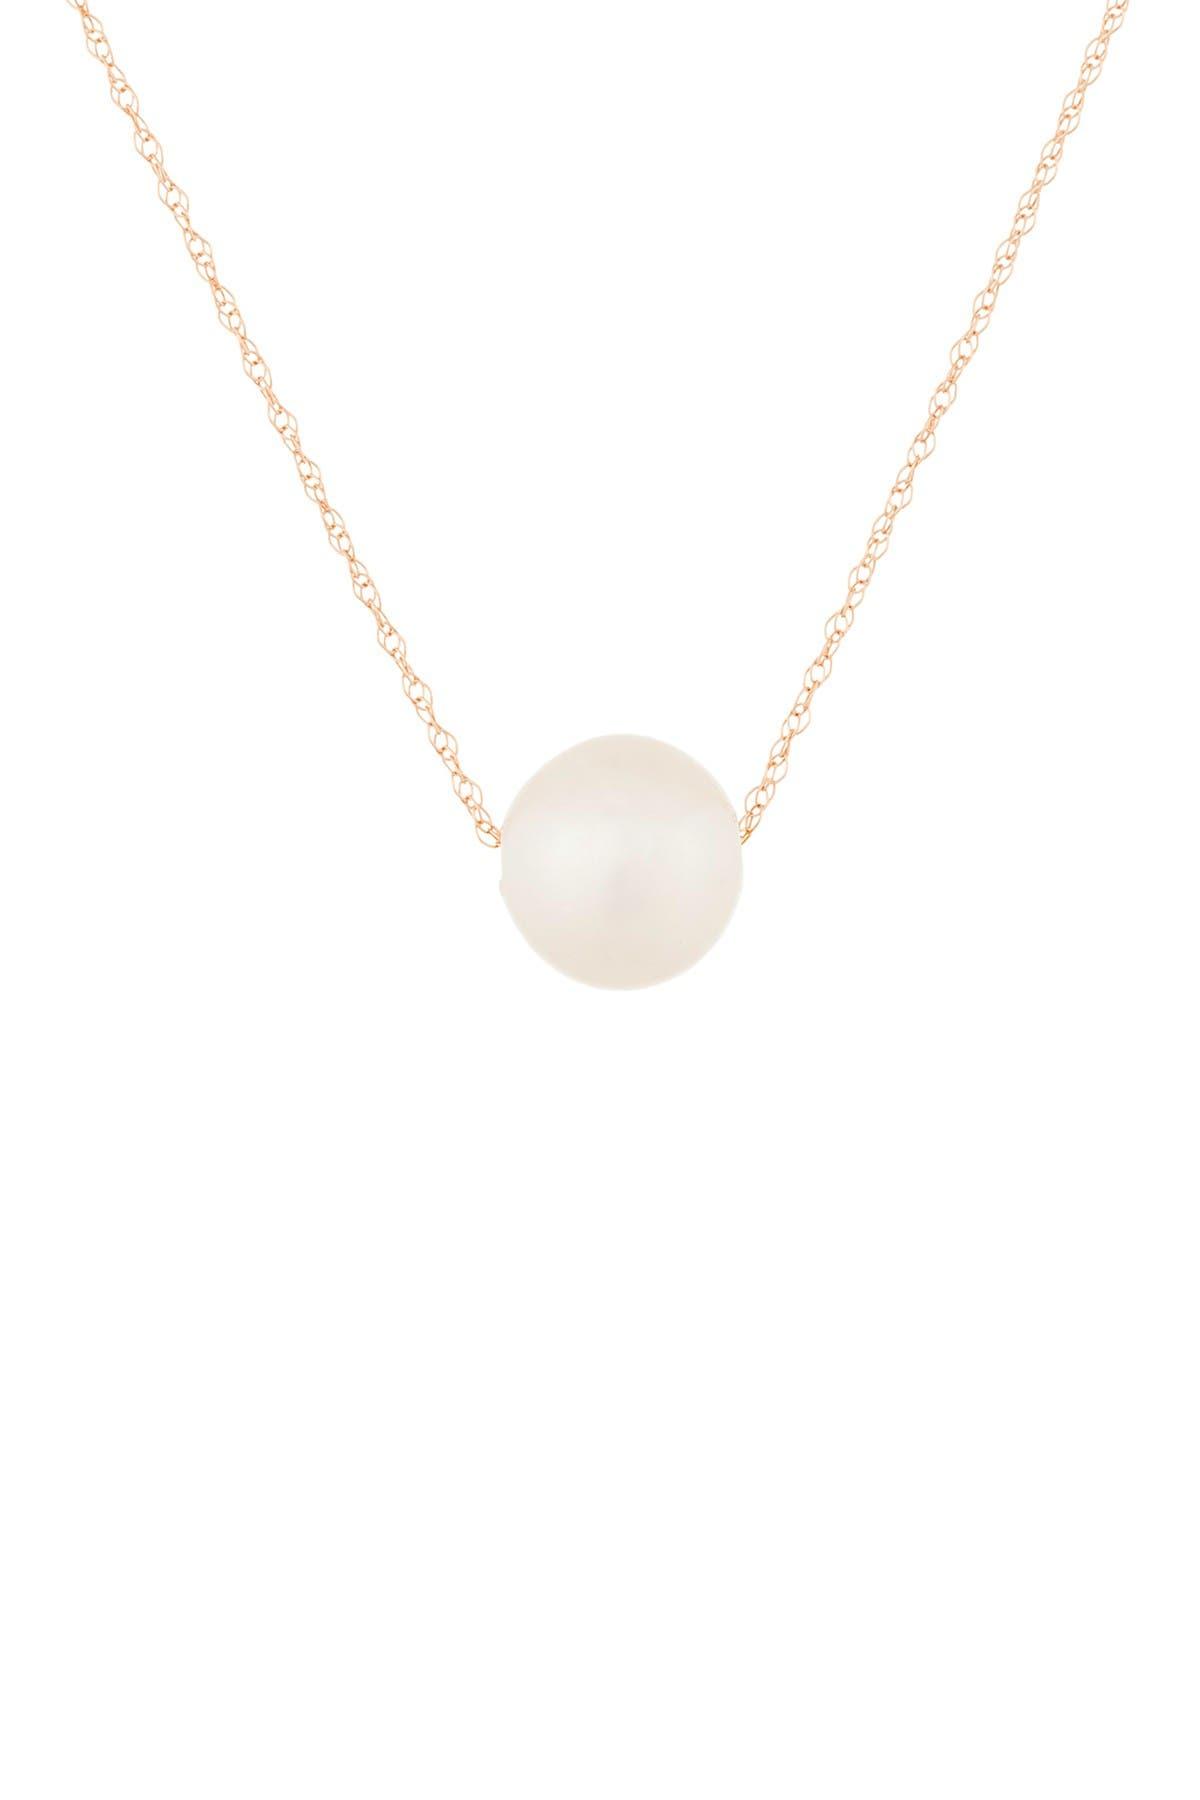 Image of Splendid Pearls 14K Rose Gold 8-9mm Akoya Pearl Pendant Necklace